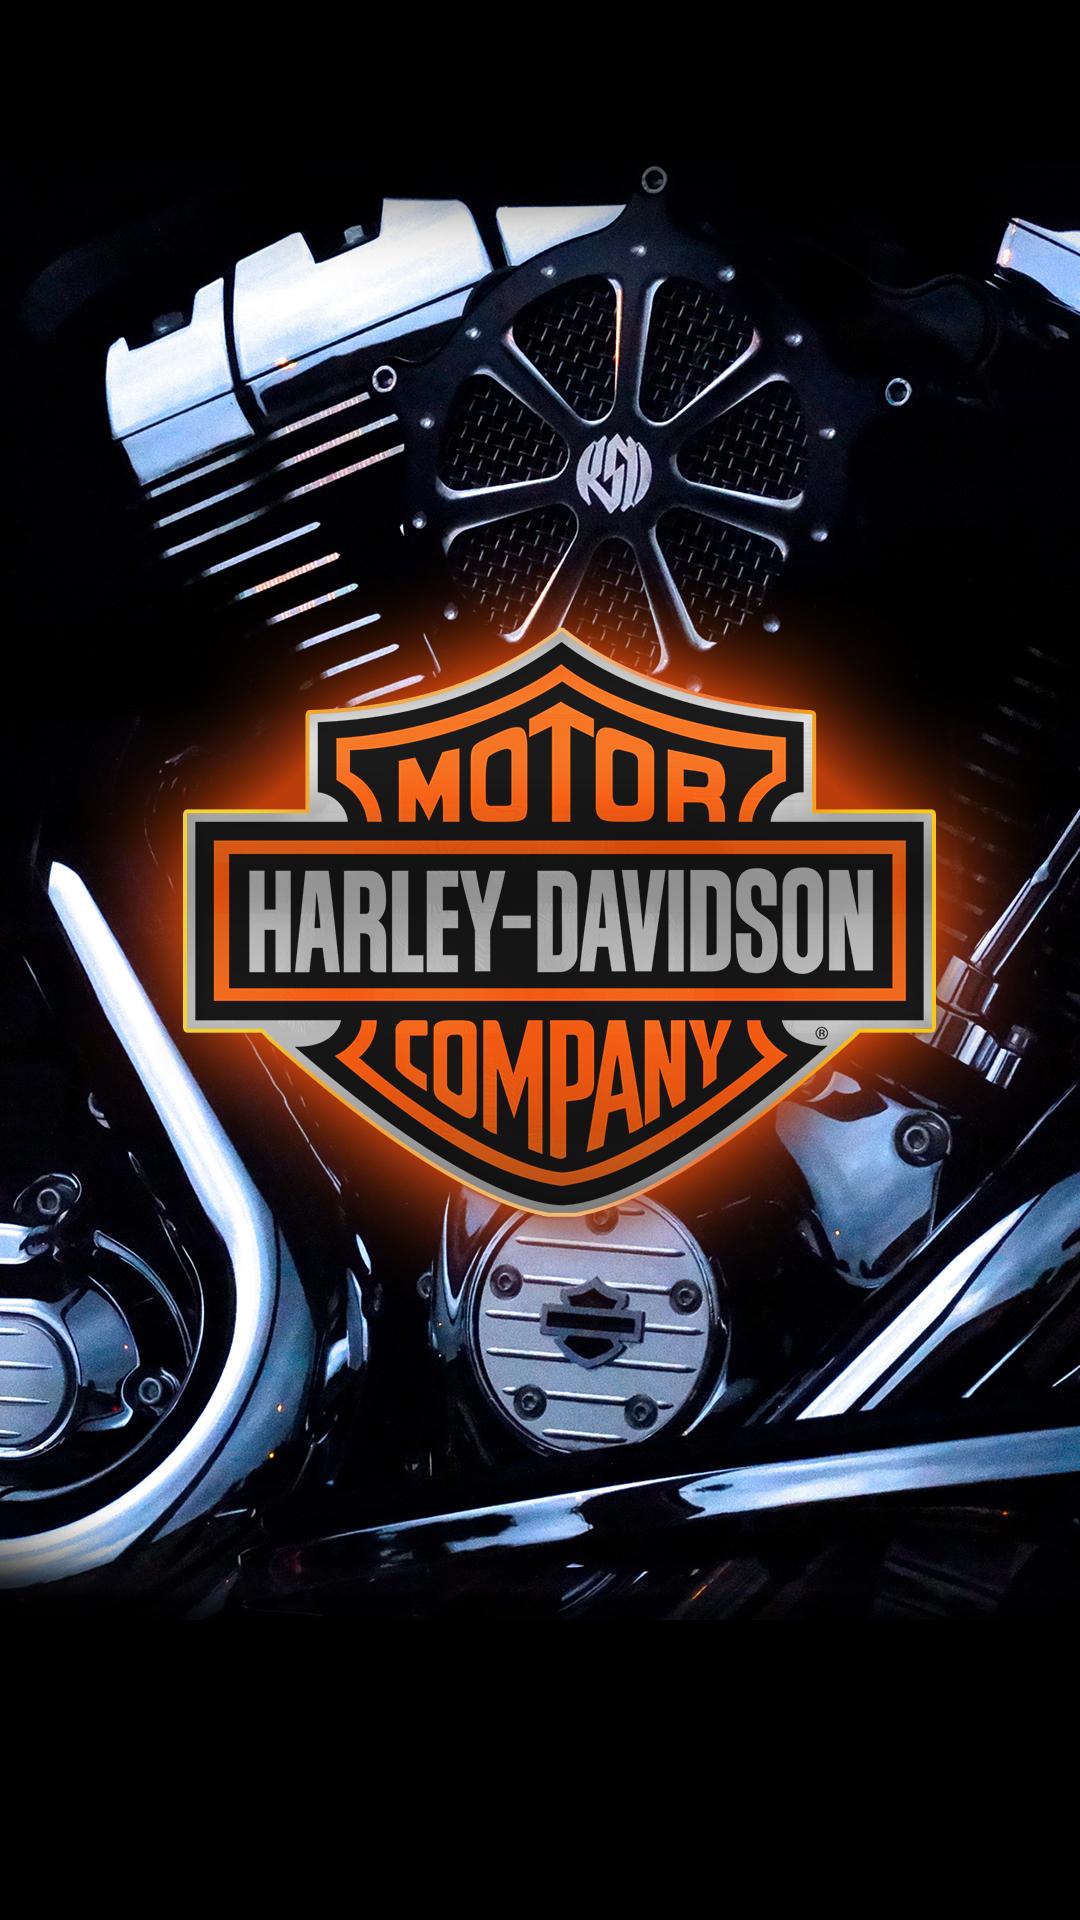 Harley Davidson 1080 x 1920 HD Wallpaper 1080x1920